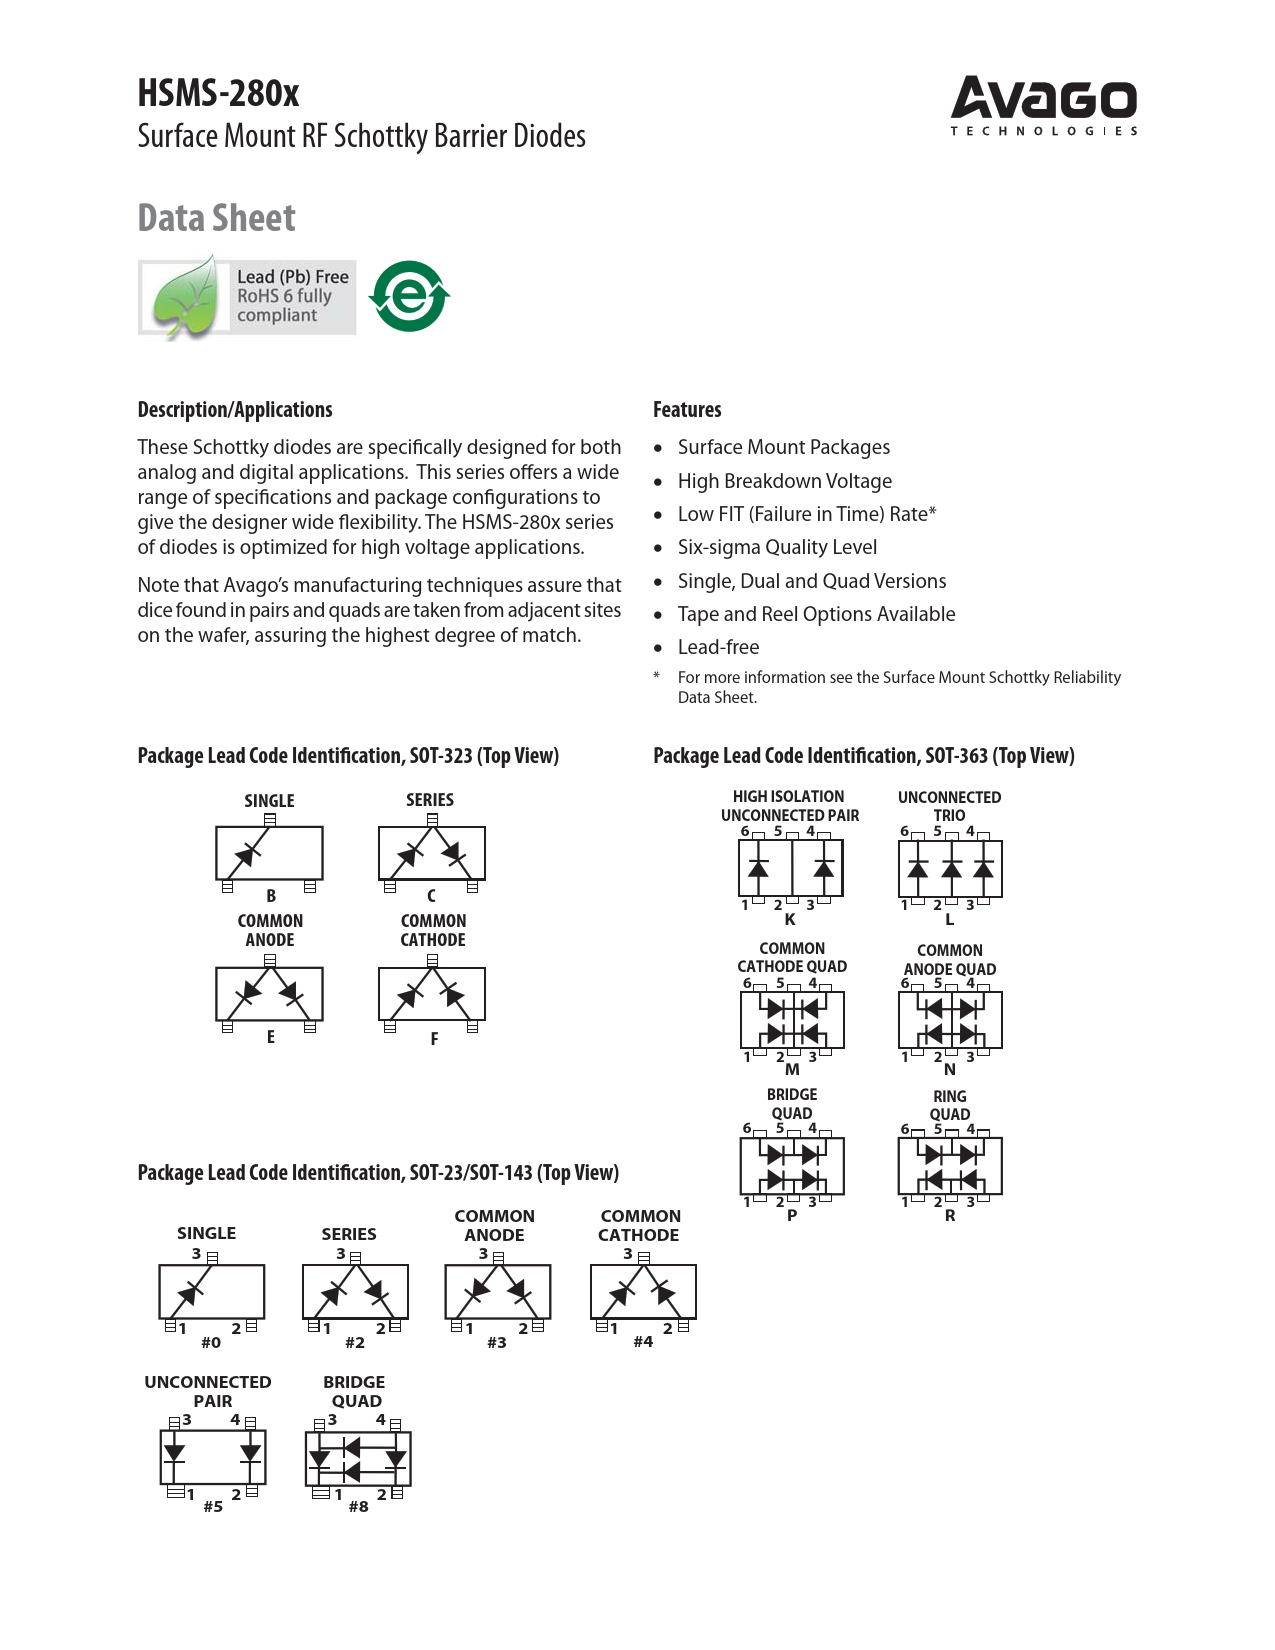 Datasheet HSMS-2800 Avago Technologies